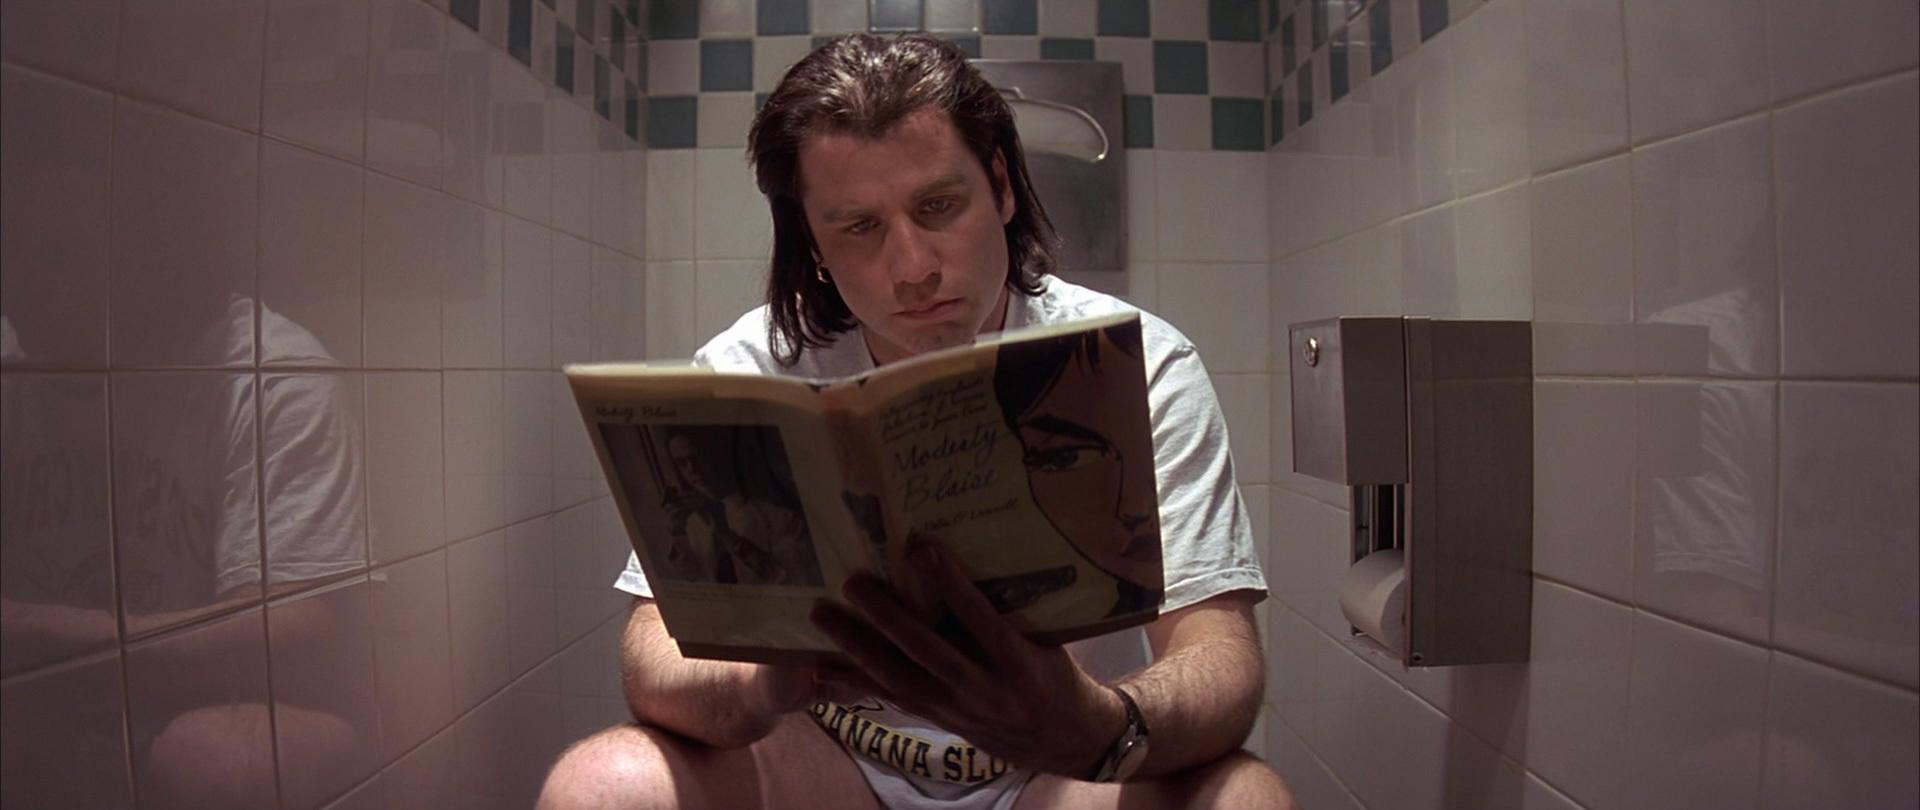 """Pulp Fiction"", reż. Quentin Tarantino (źródło: materiały prasowe organizatora)"